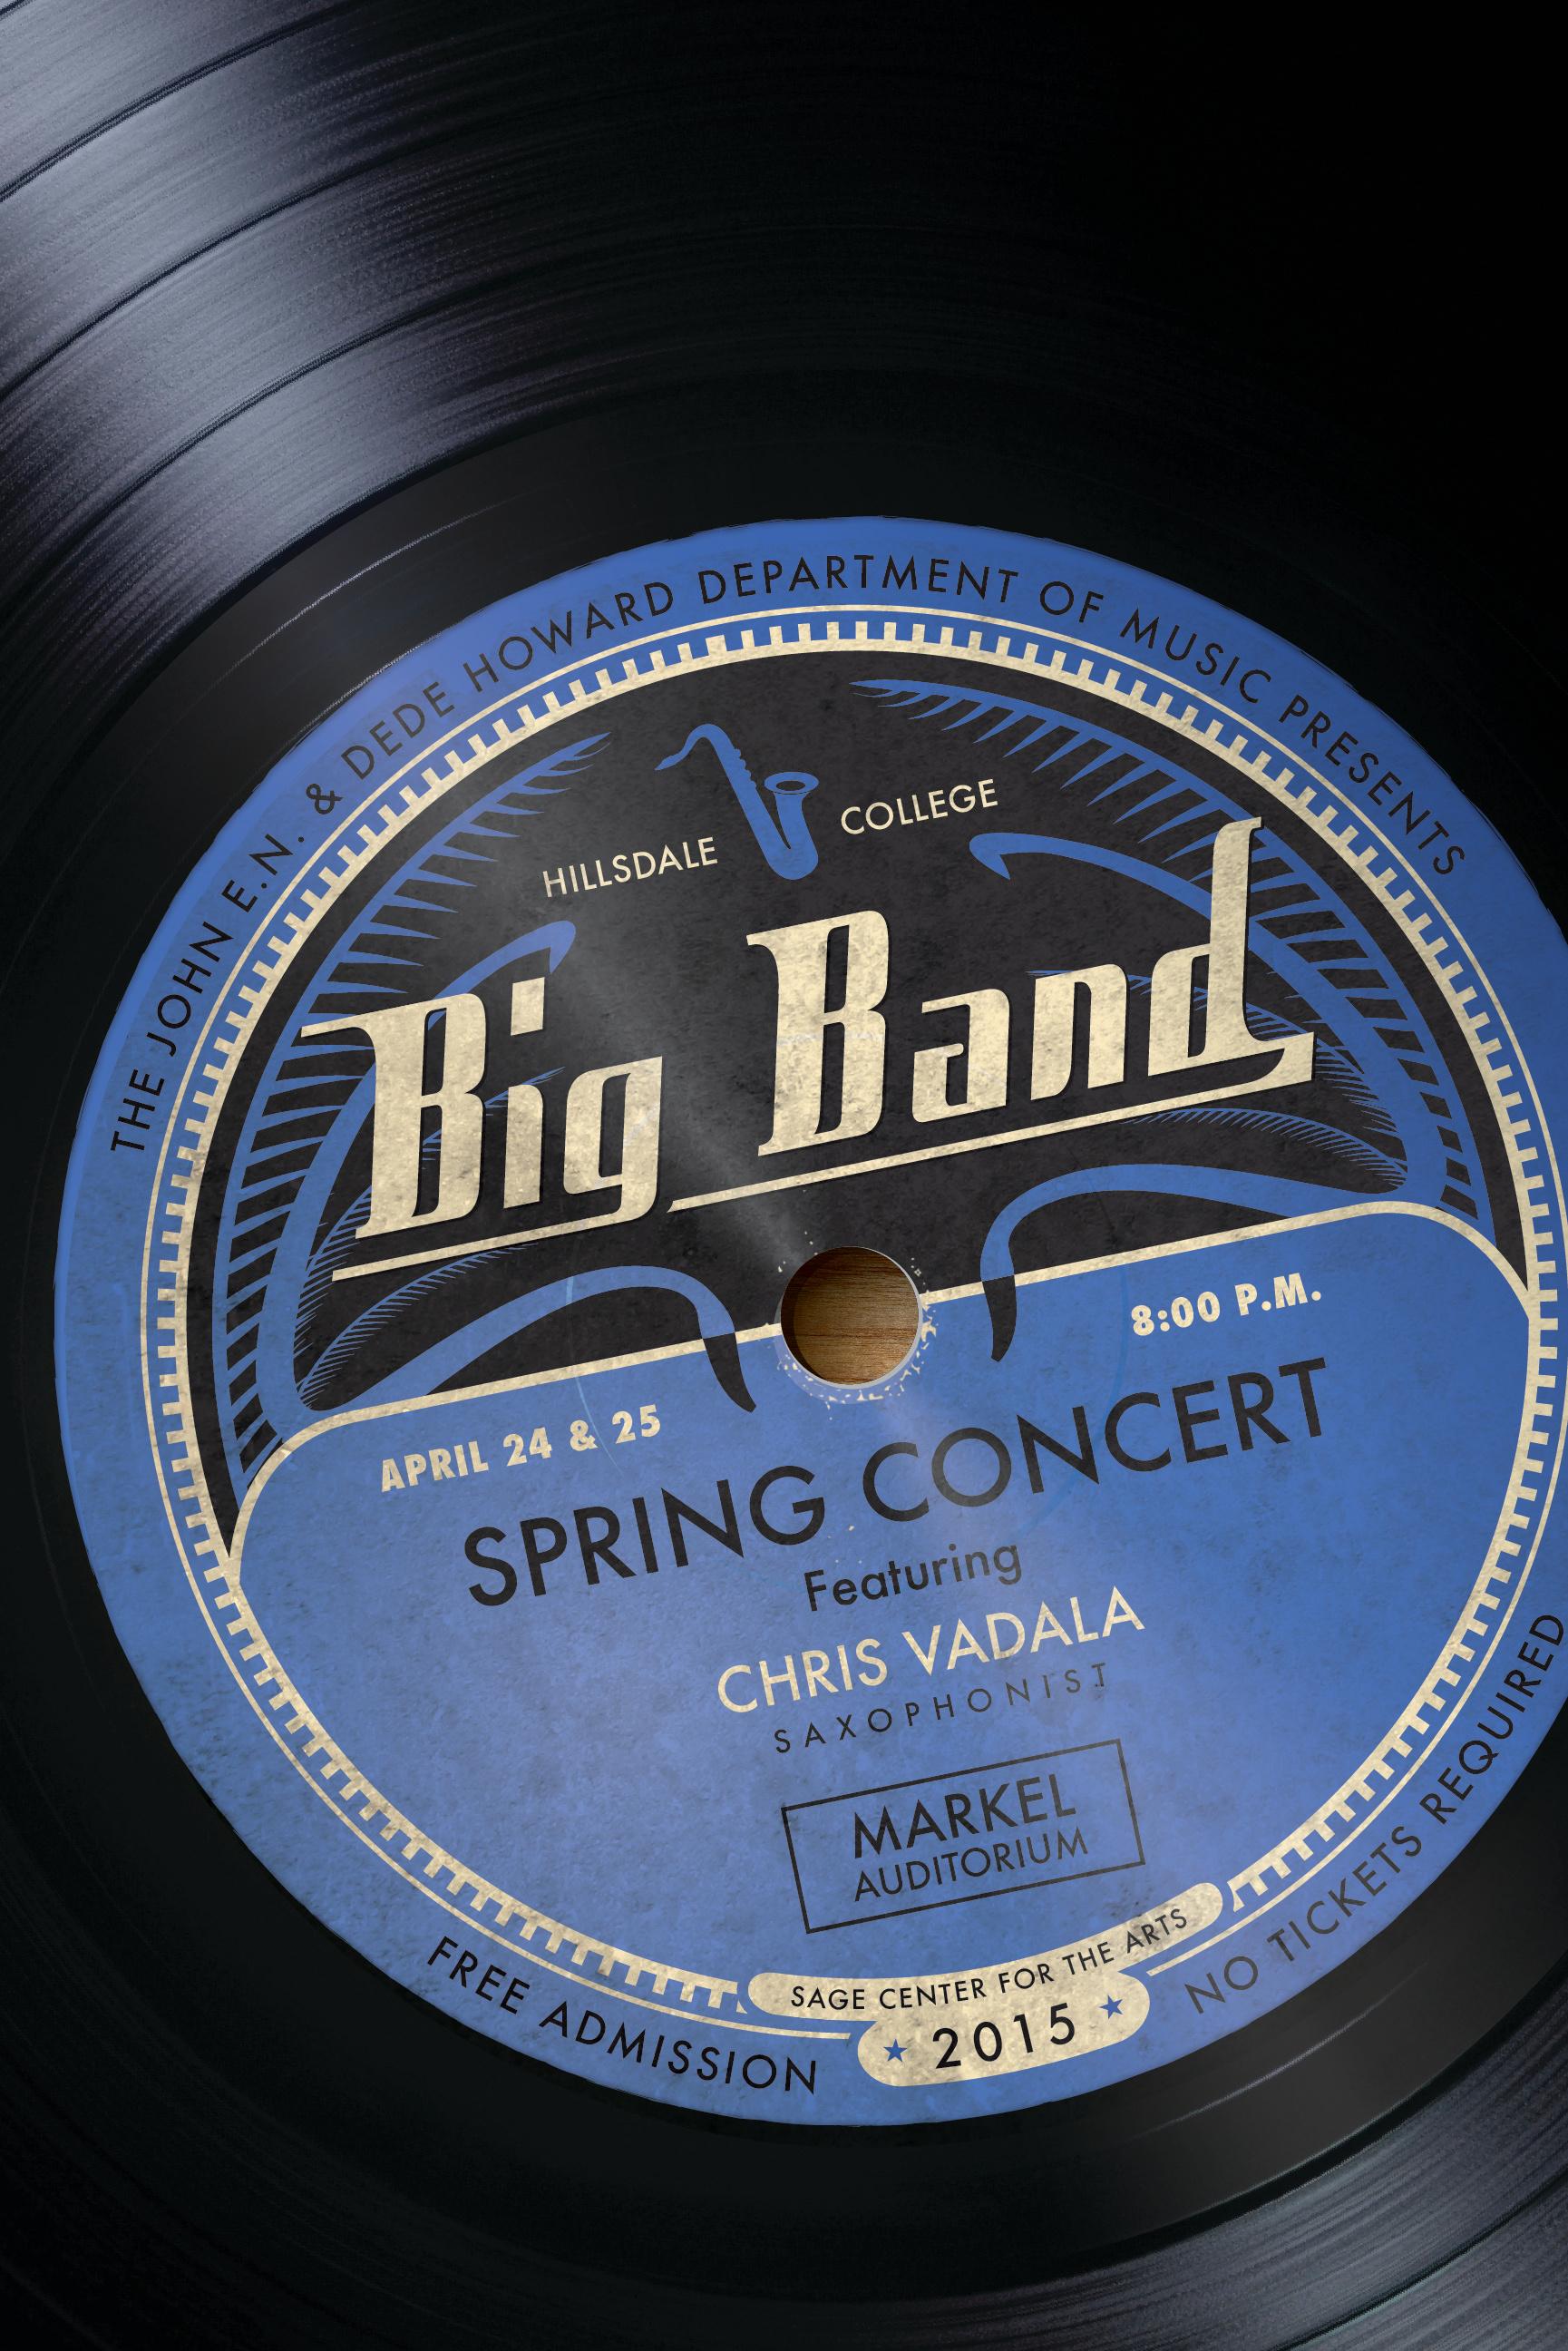 Big Band Poster 2015